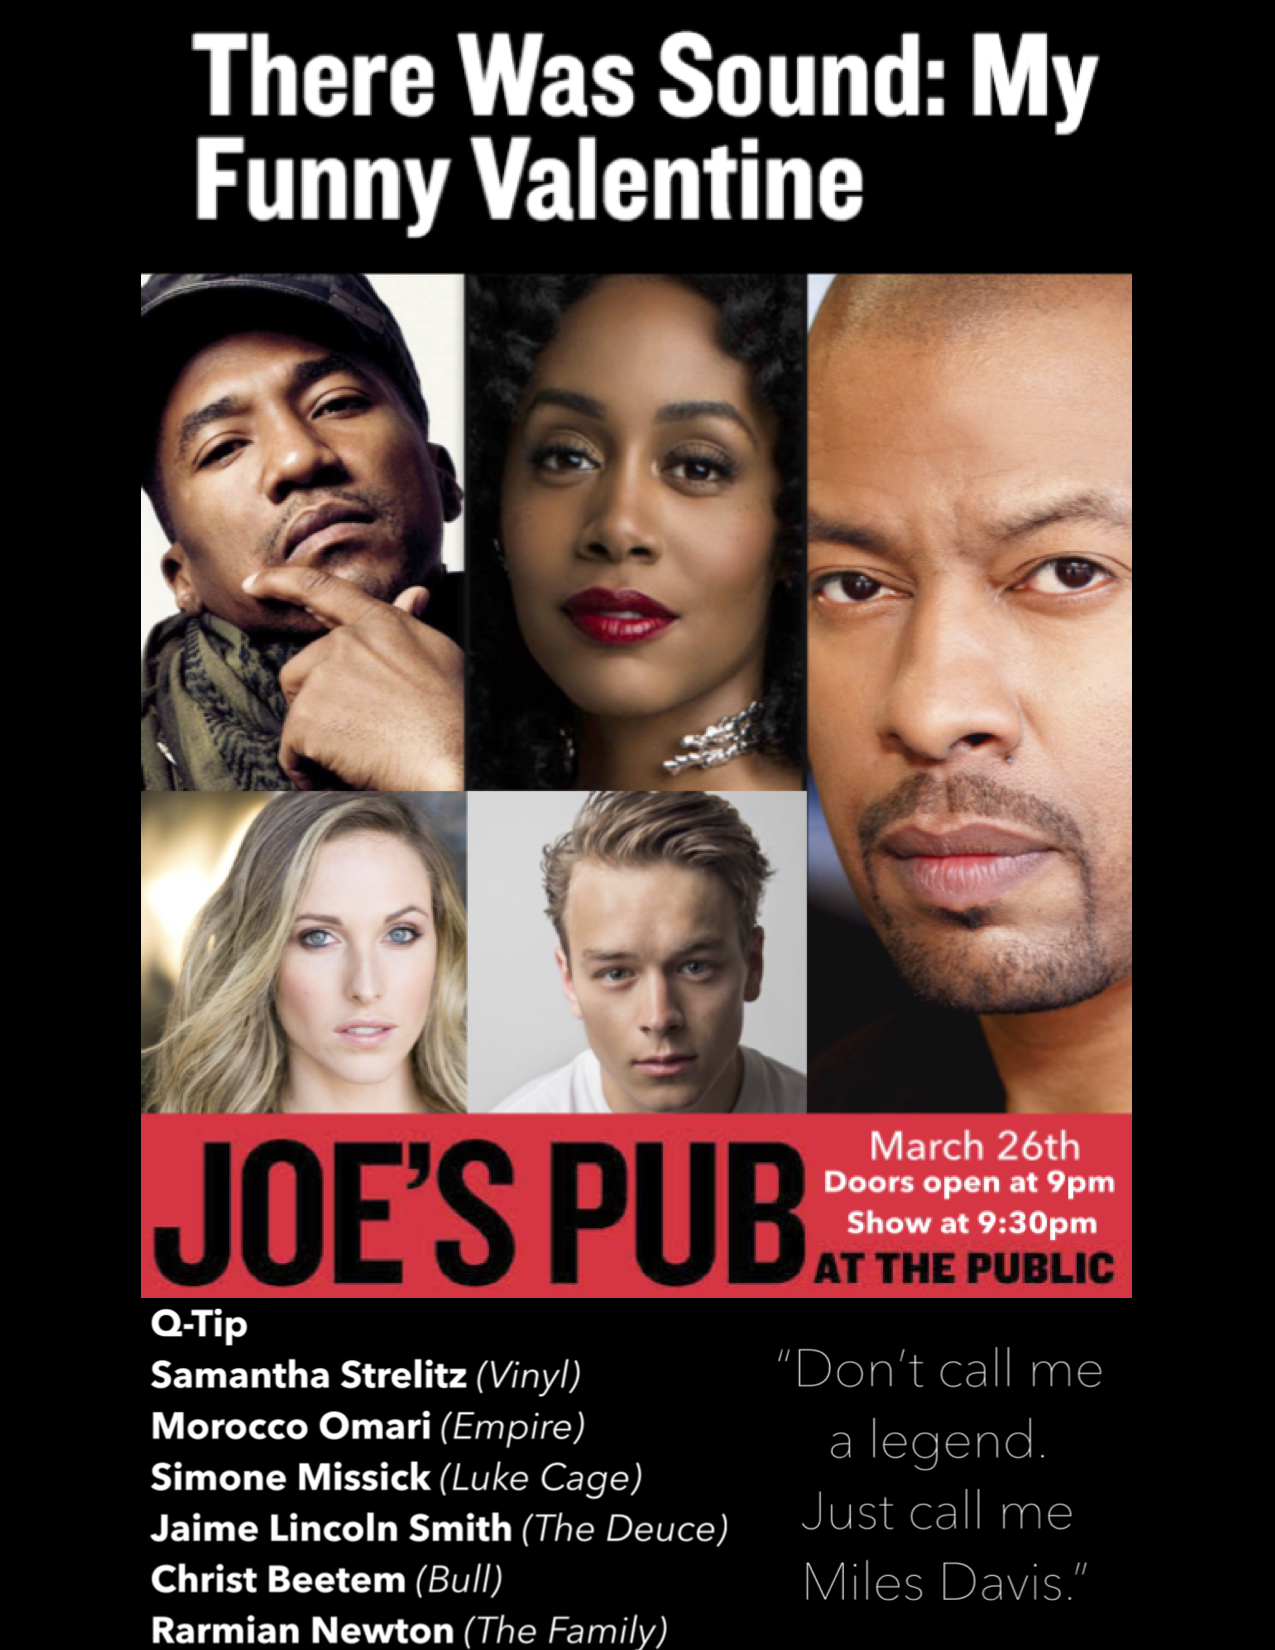 Joe's Pub Poster.jpg